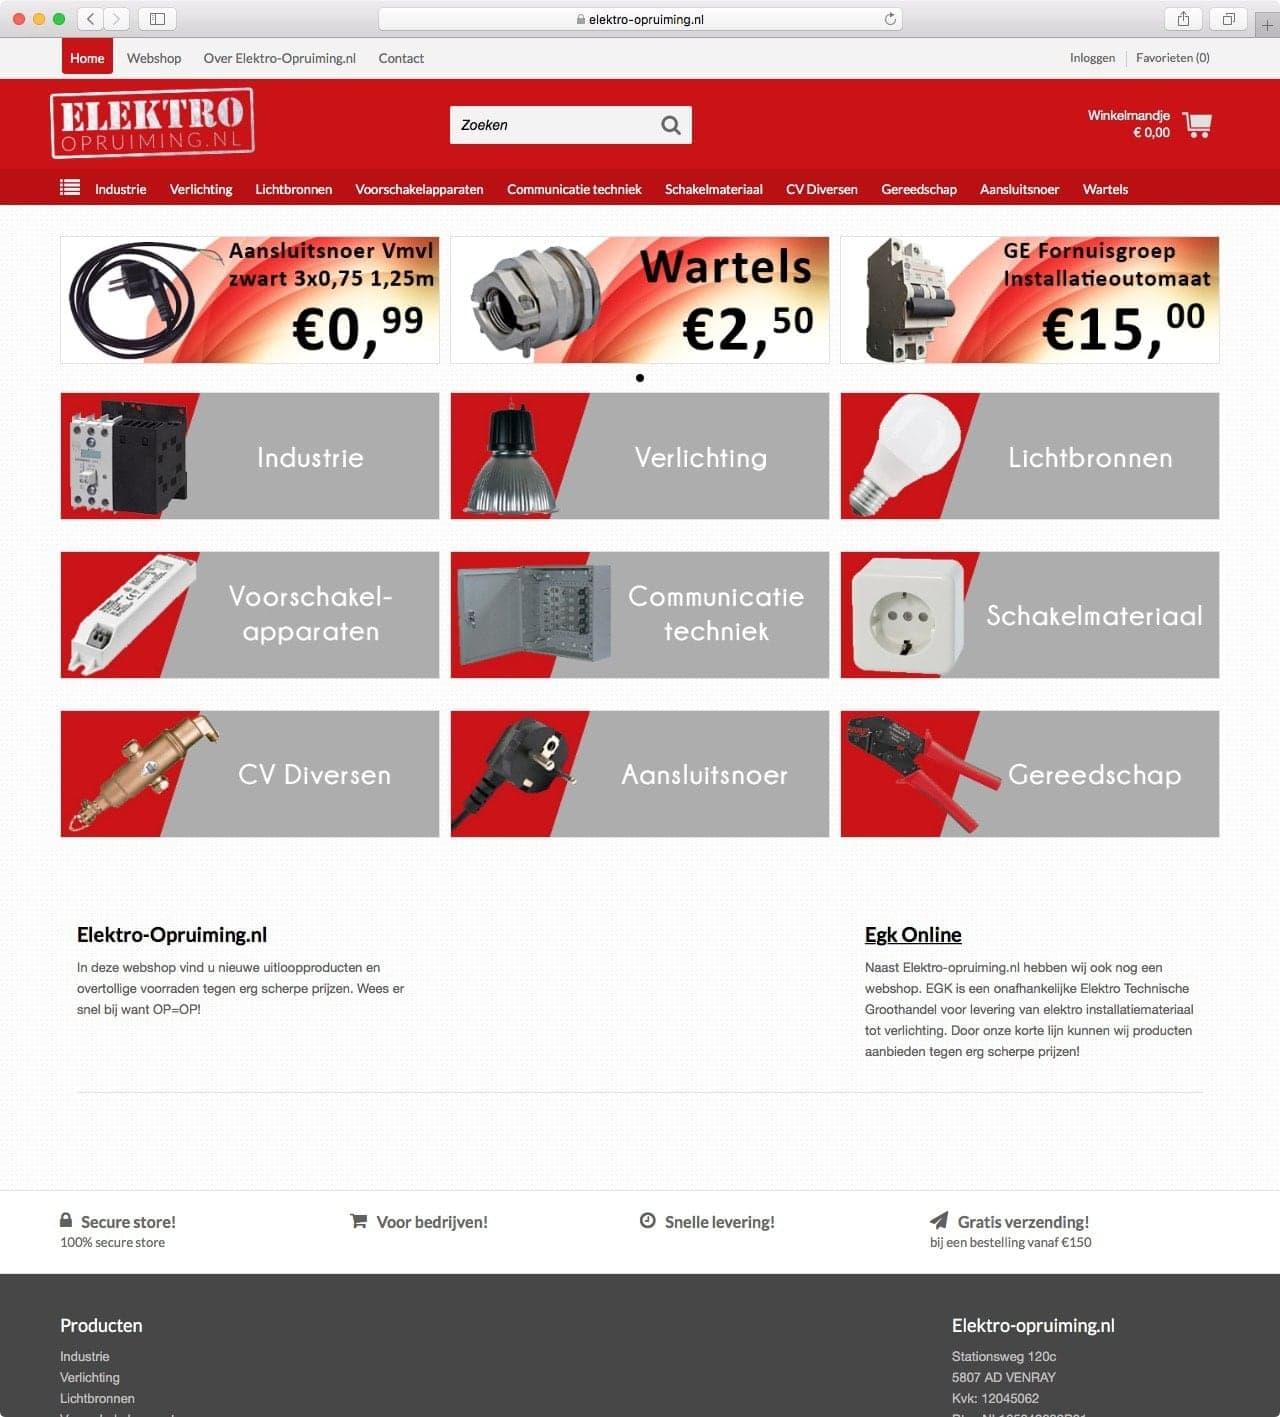 Elektro-opruiming.nl